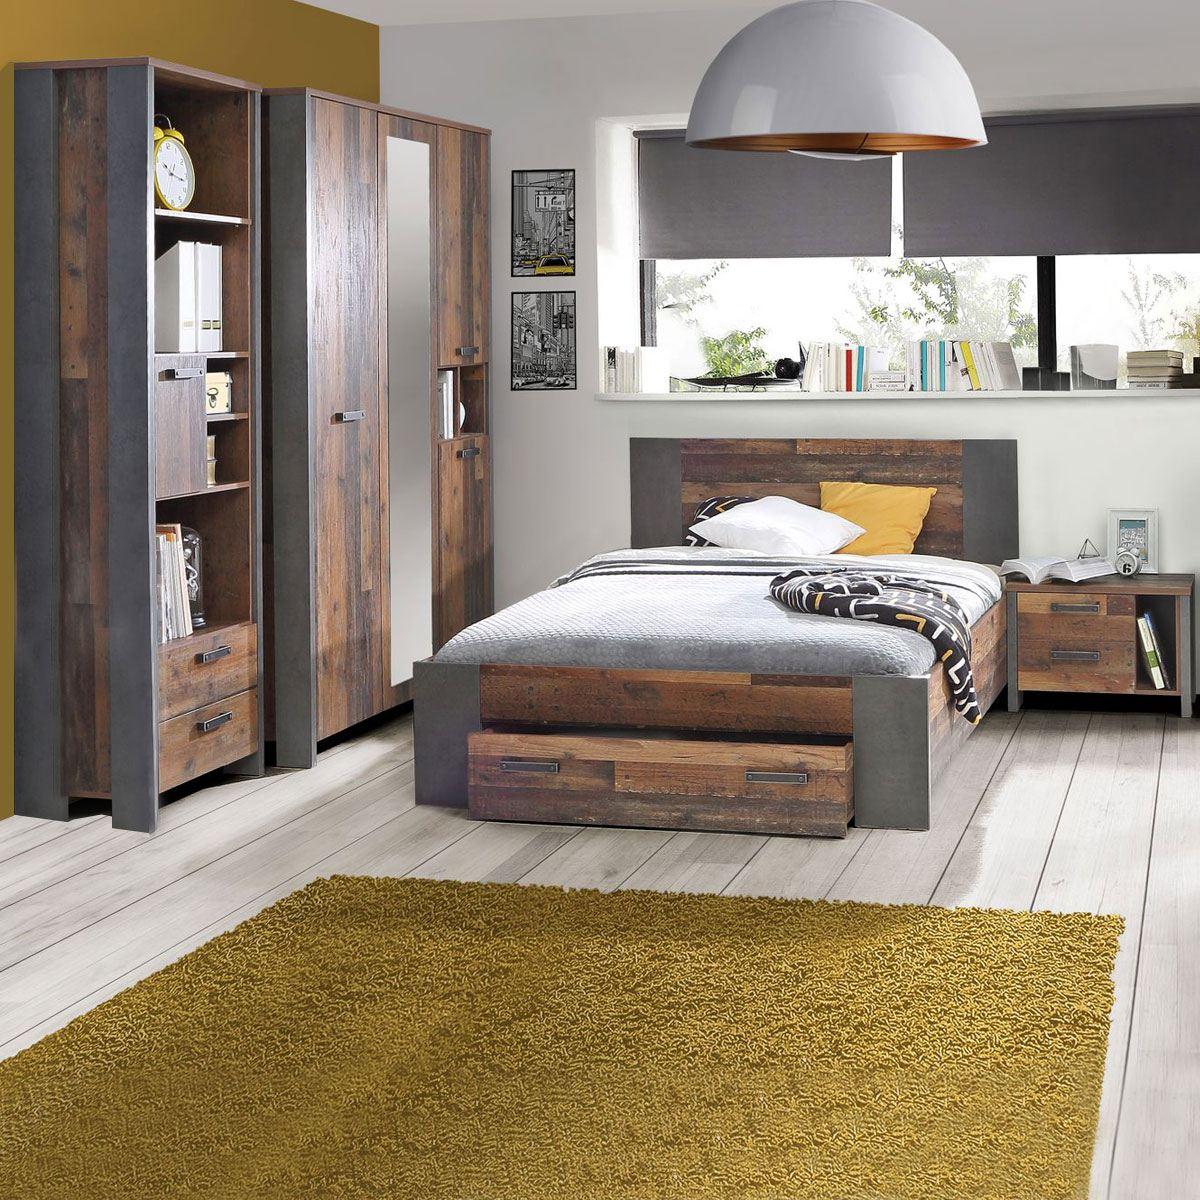 forte clif jugendzimmer bett kleiderschrank regal nachtkommode. Black Bedroom Furniture Sets. Home Design Ideas